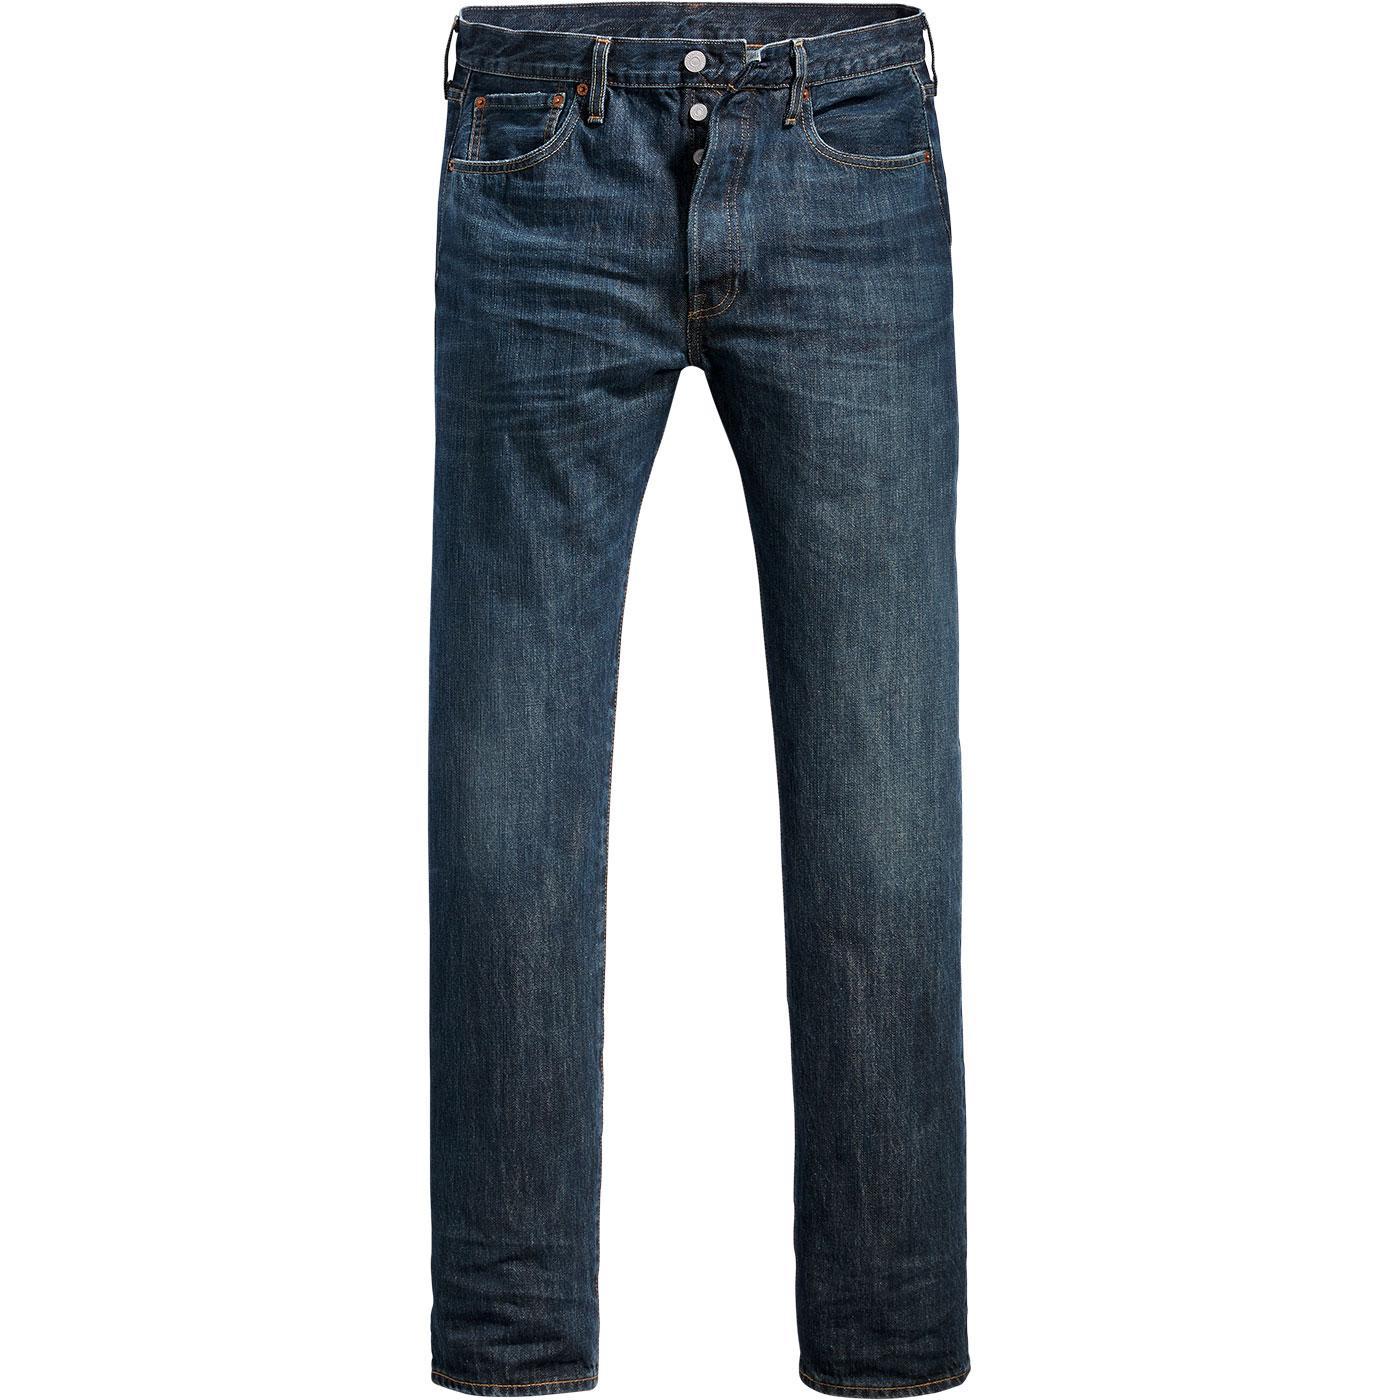 LEVI'S 501 Original Straight Denim Jeans (Snoot)